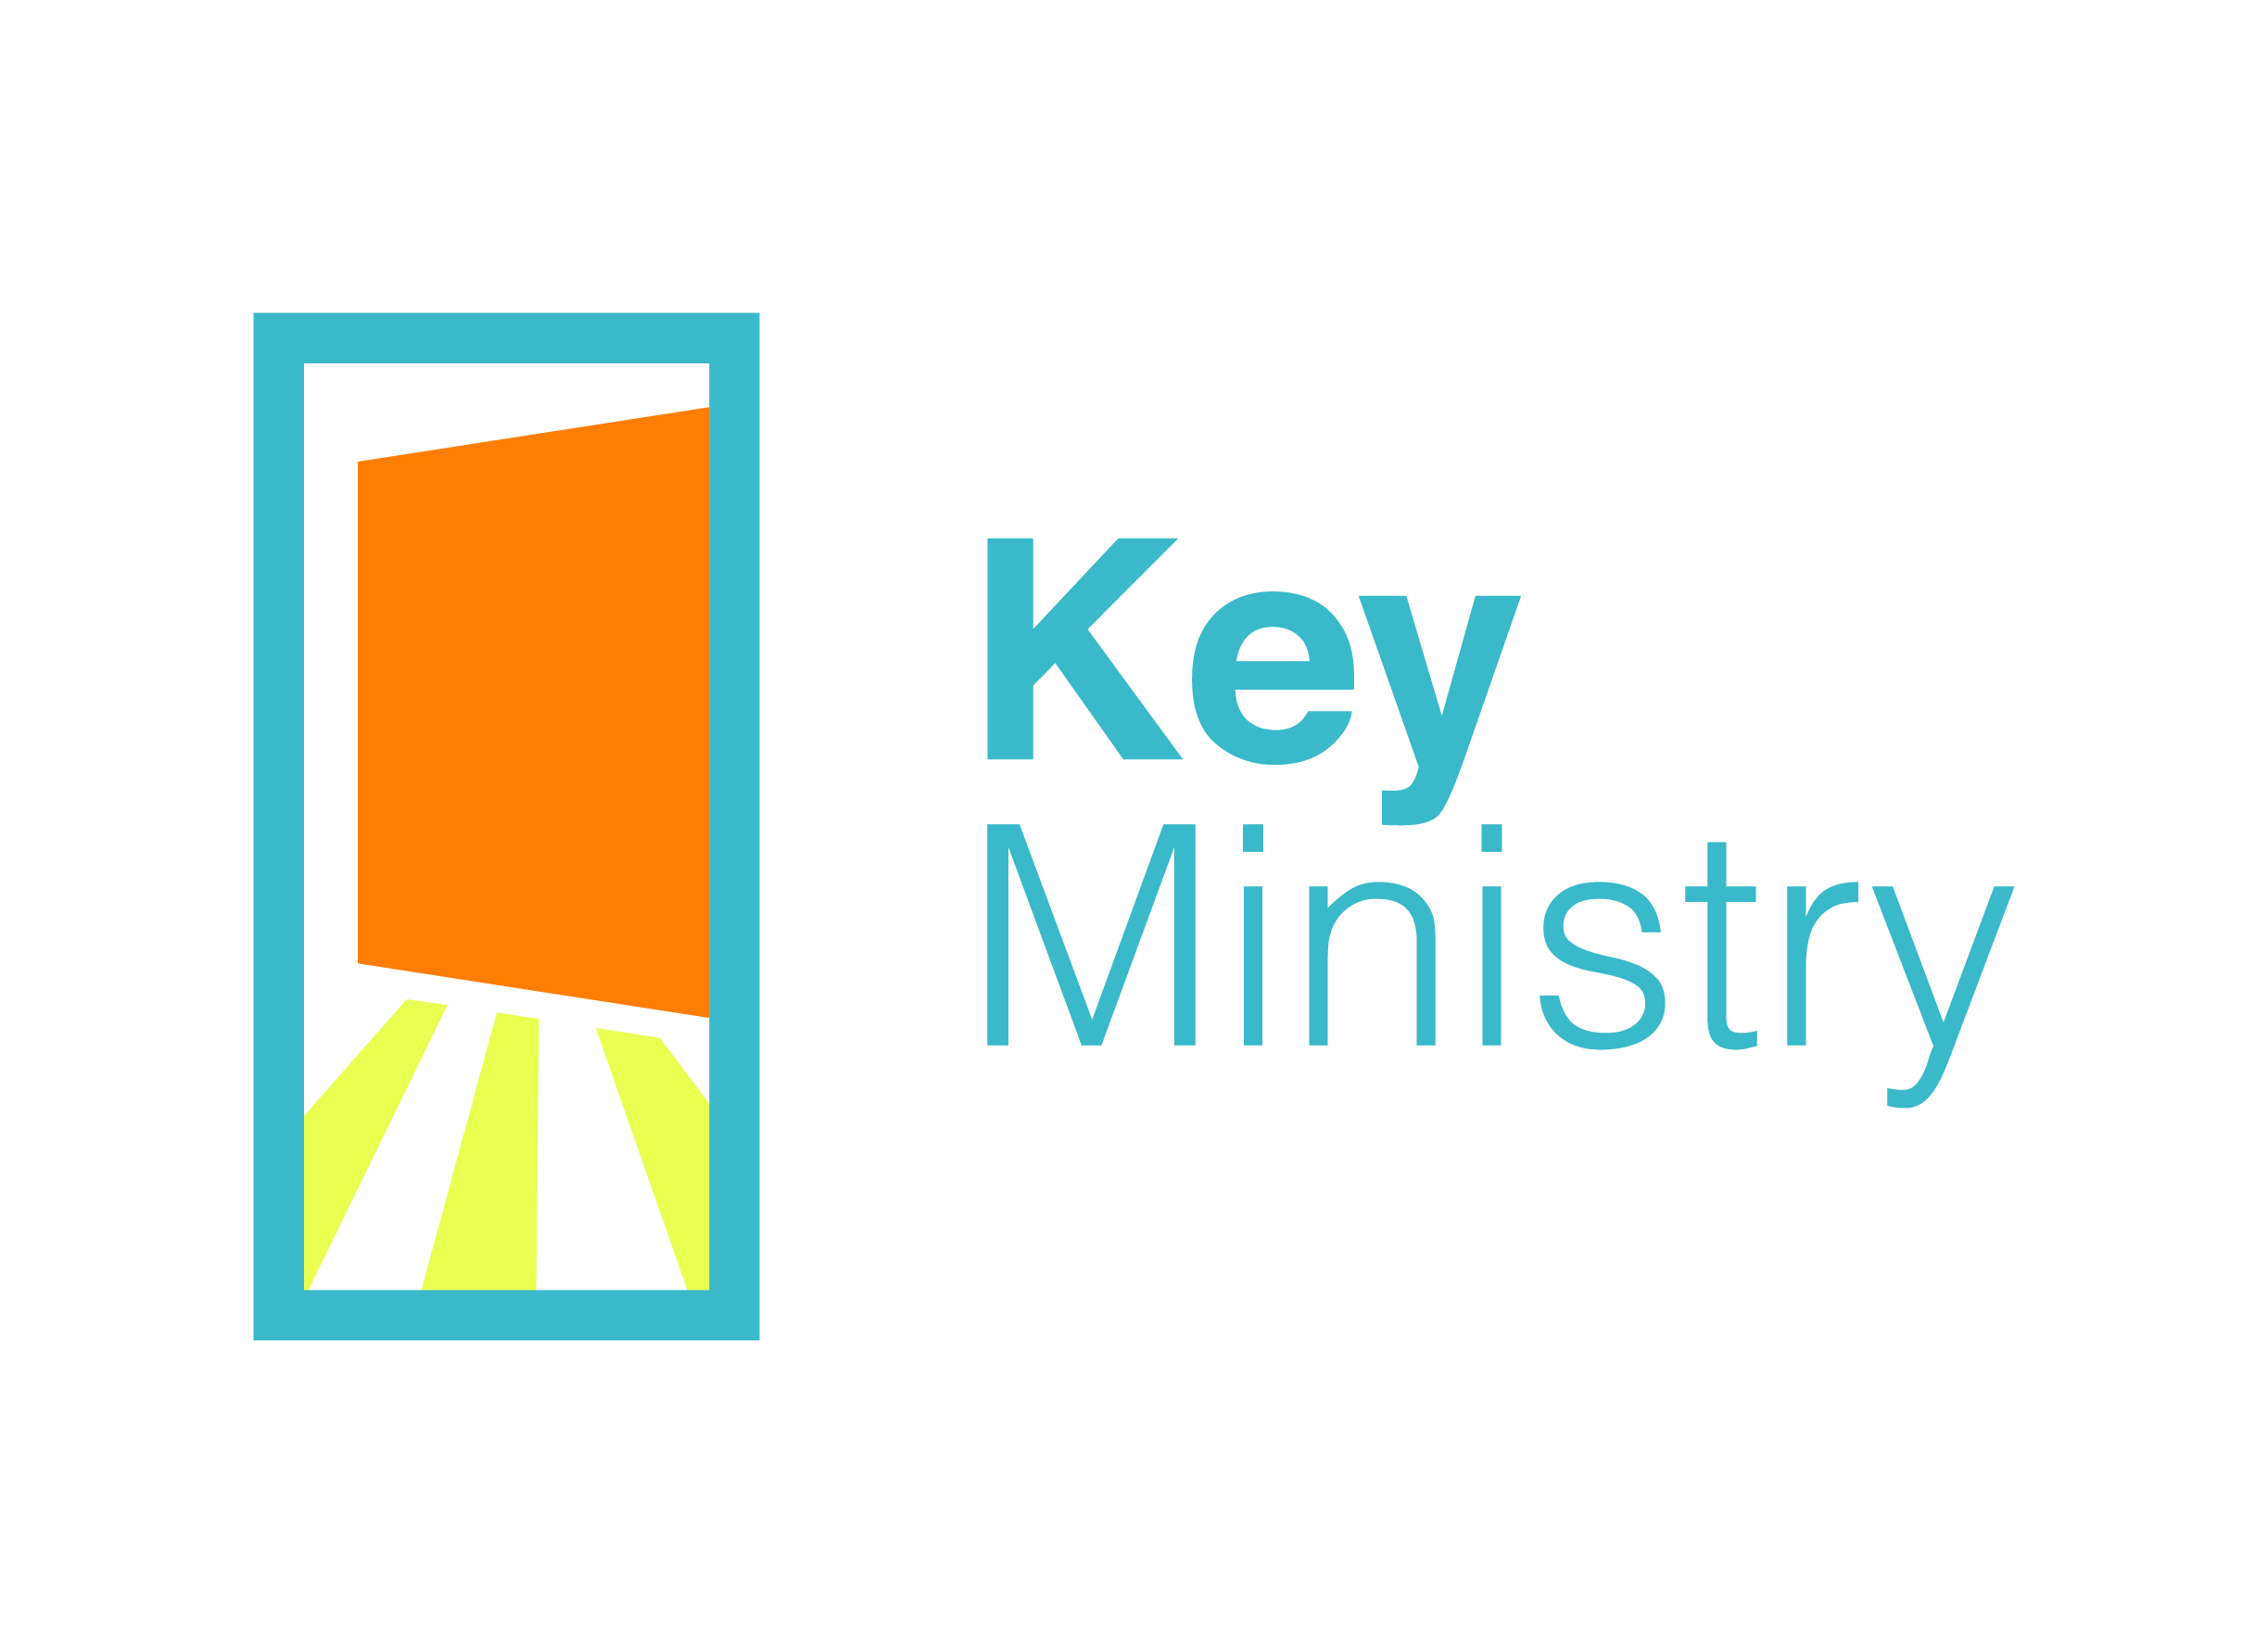 KM_Main_Logo_Color.jpg